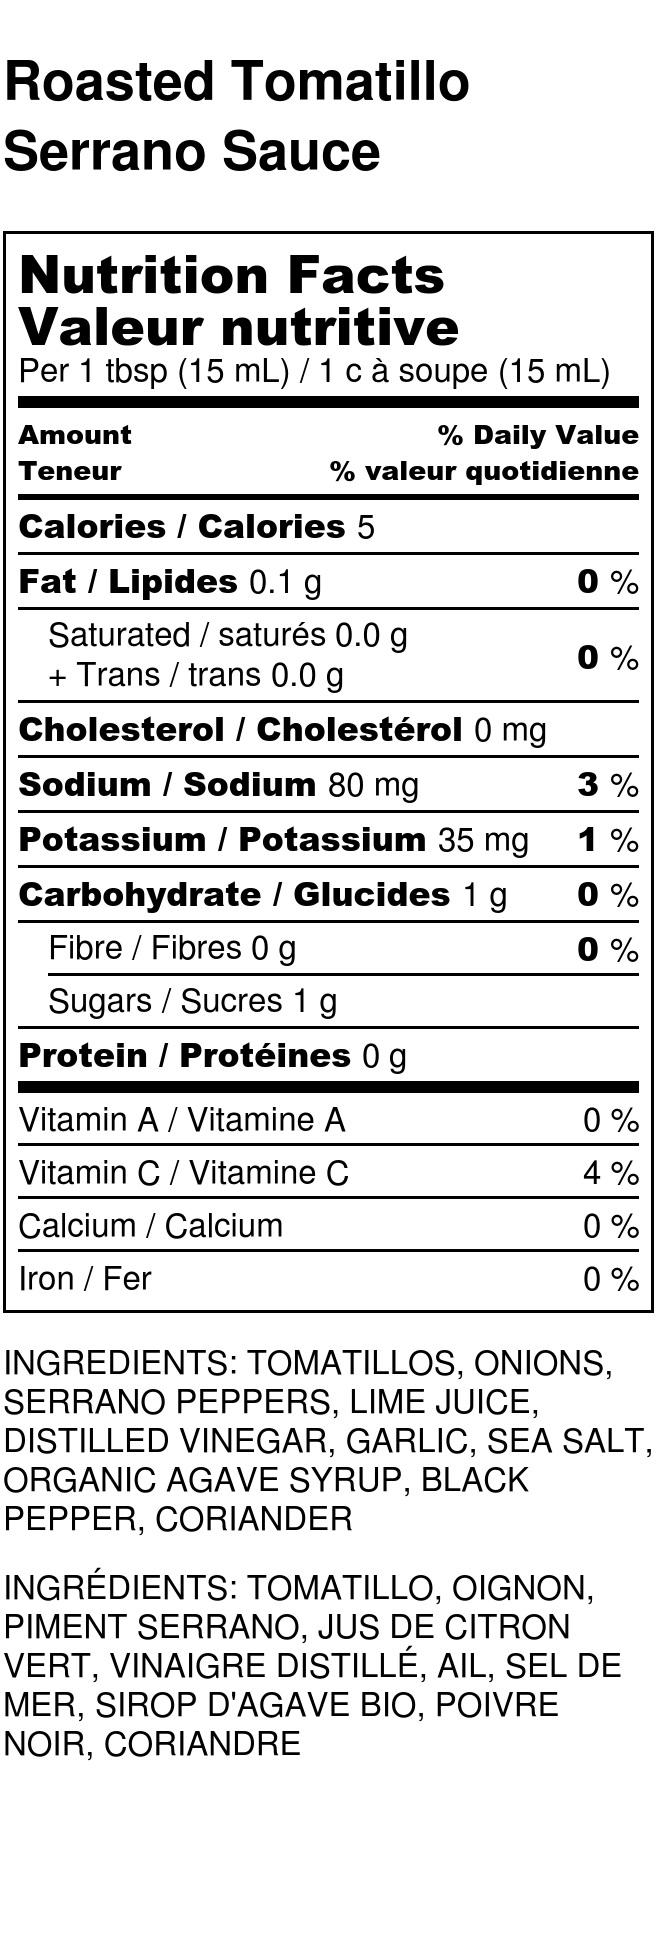 Roasted Tomatillo Serrano Sauce - Nutrition Label.jpg